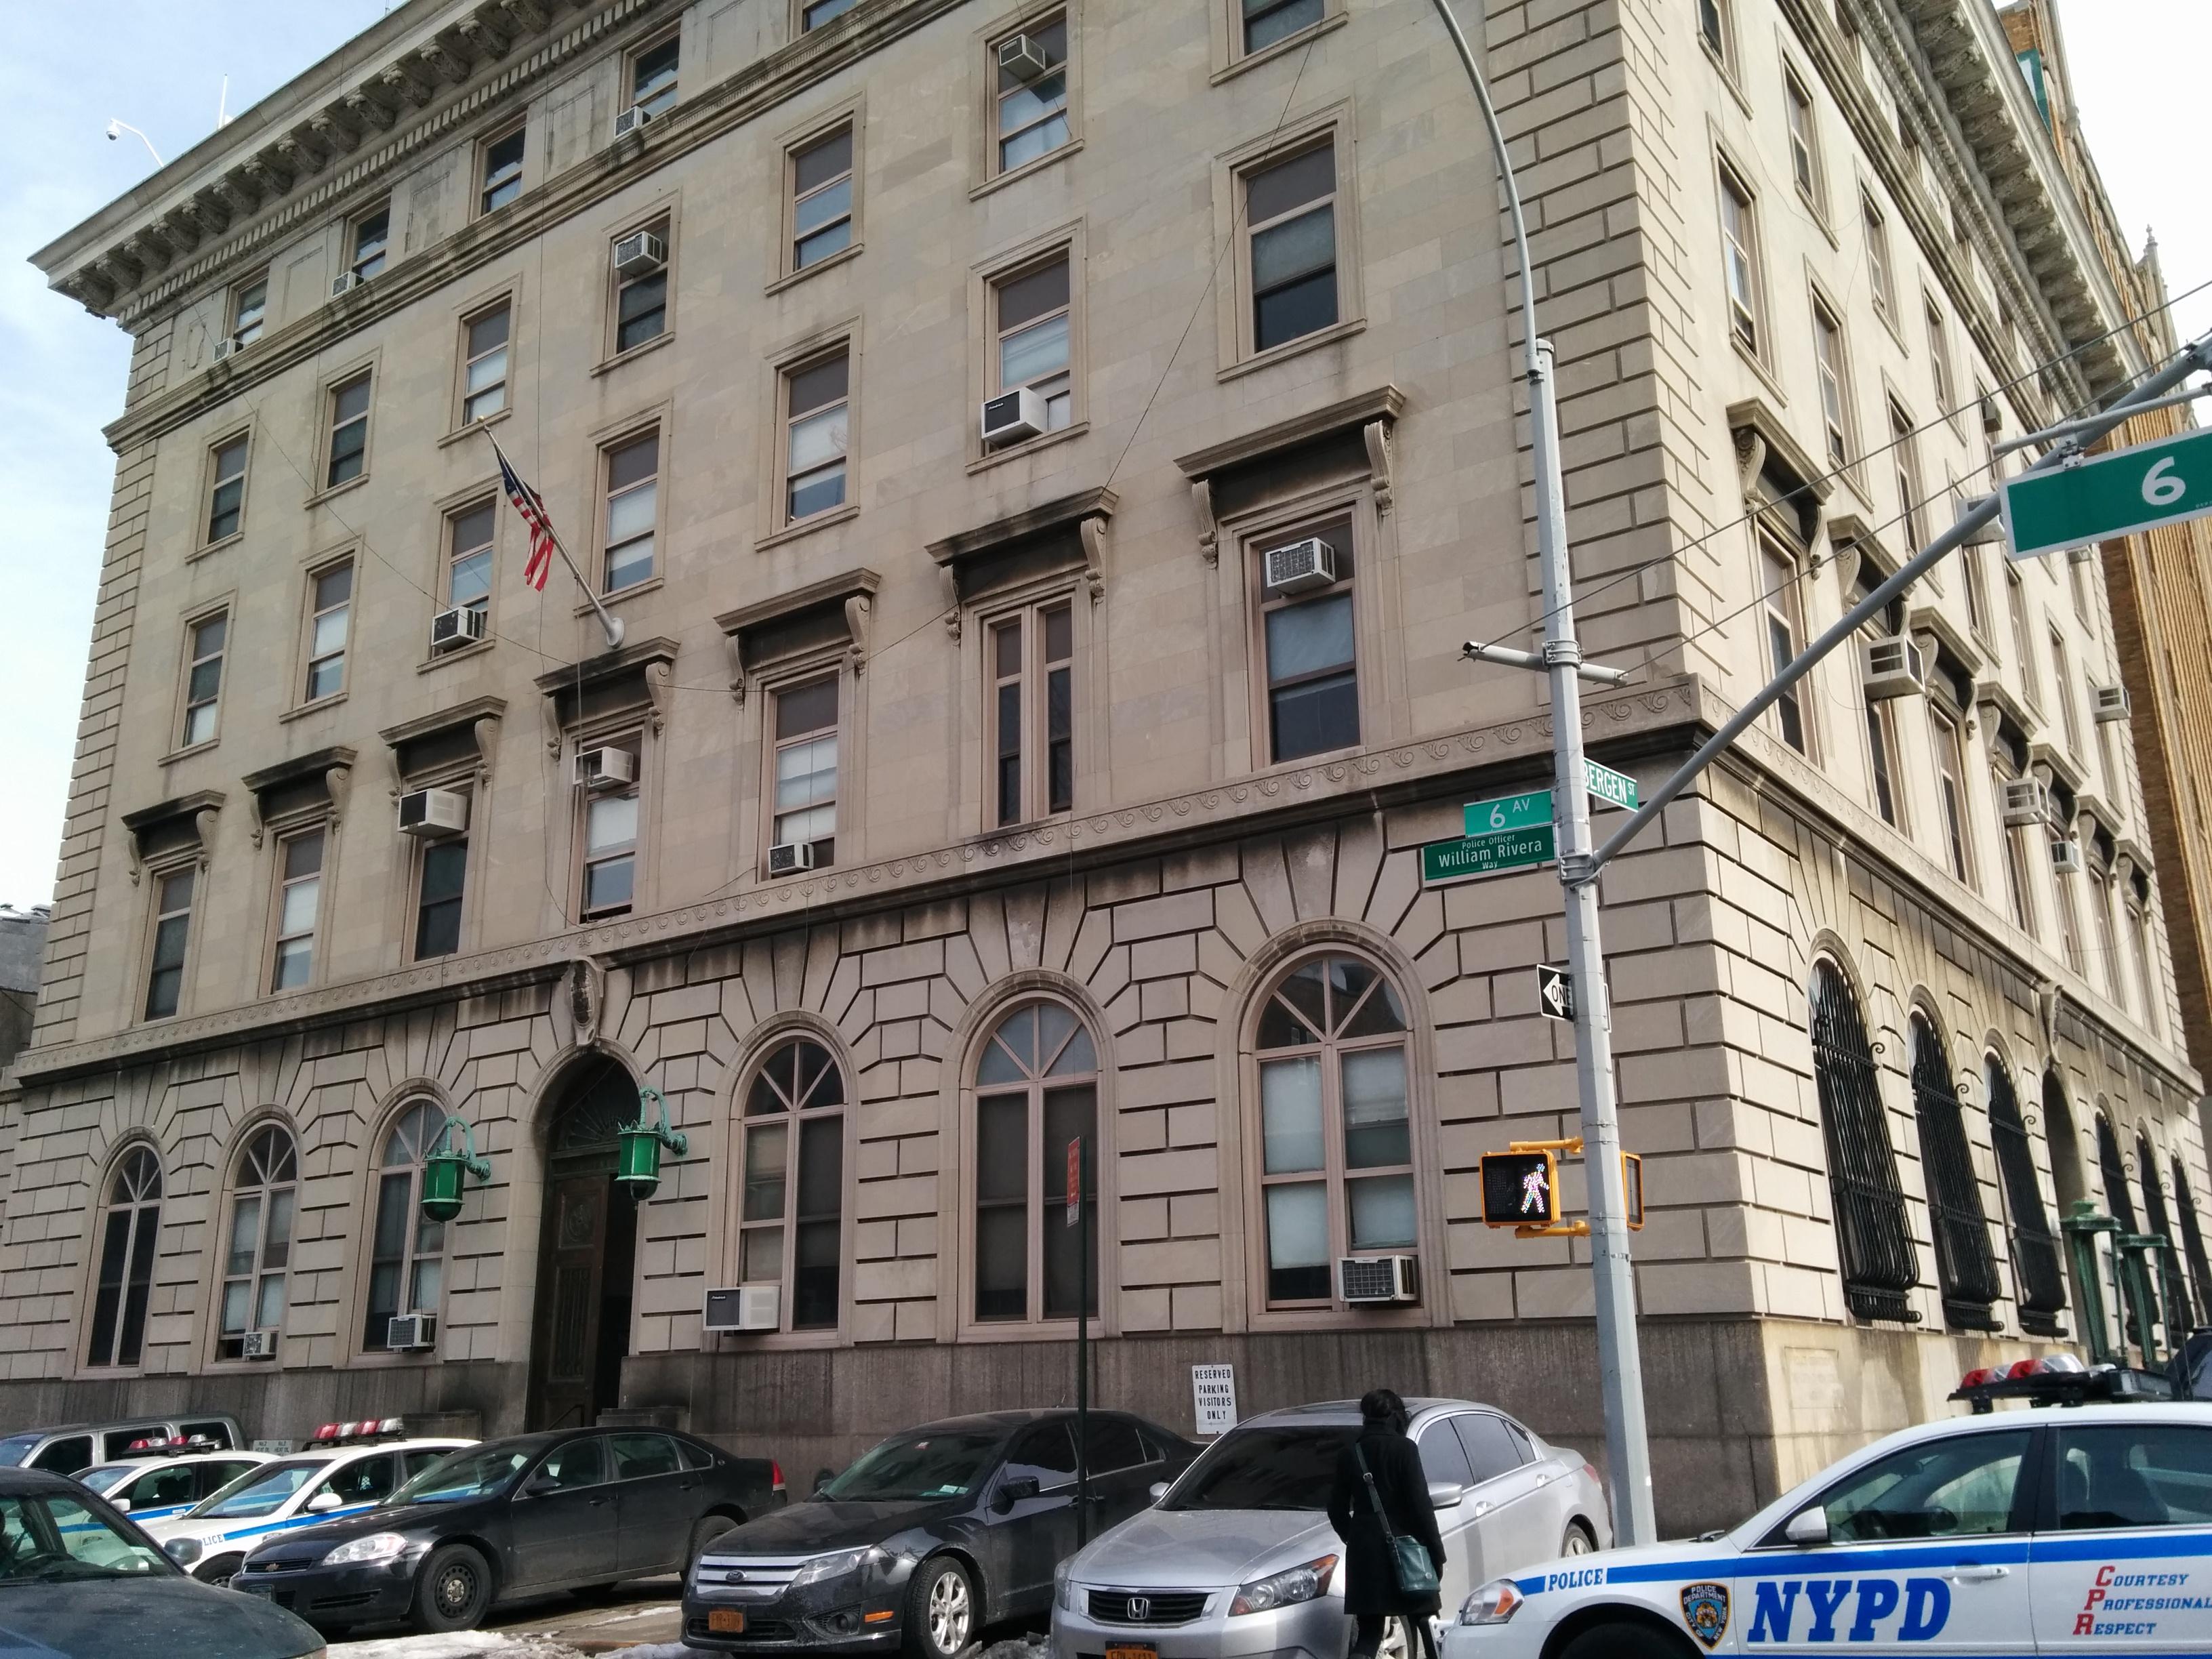 NYPD_78th_precinct.jpg